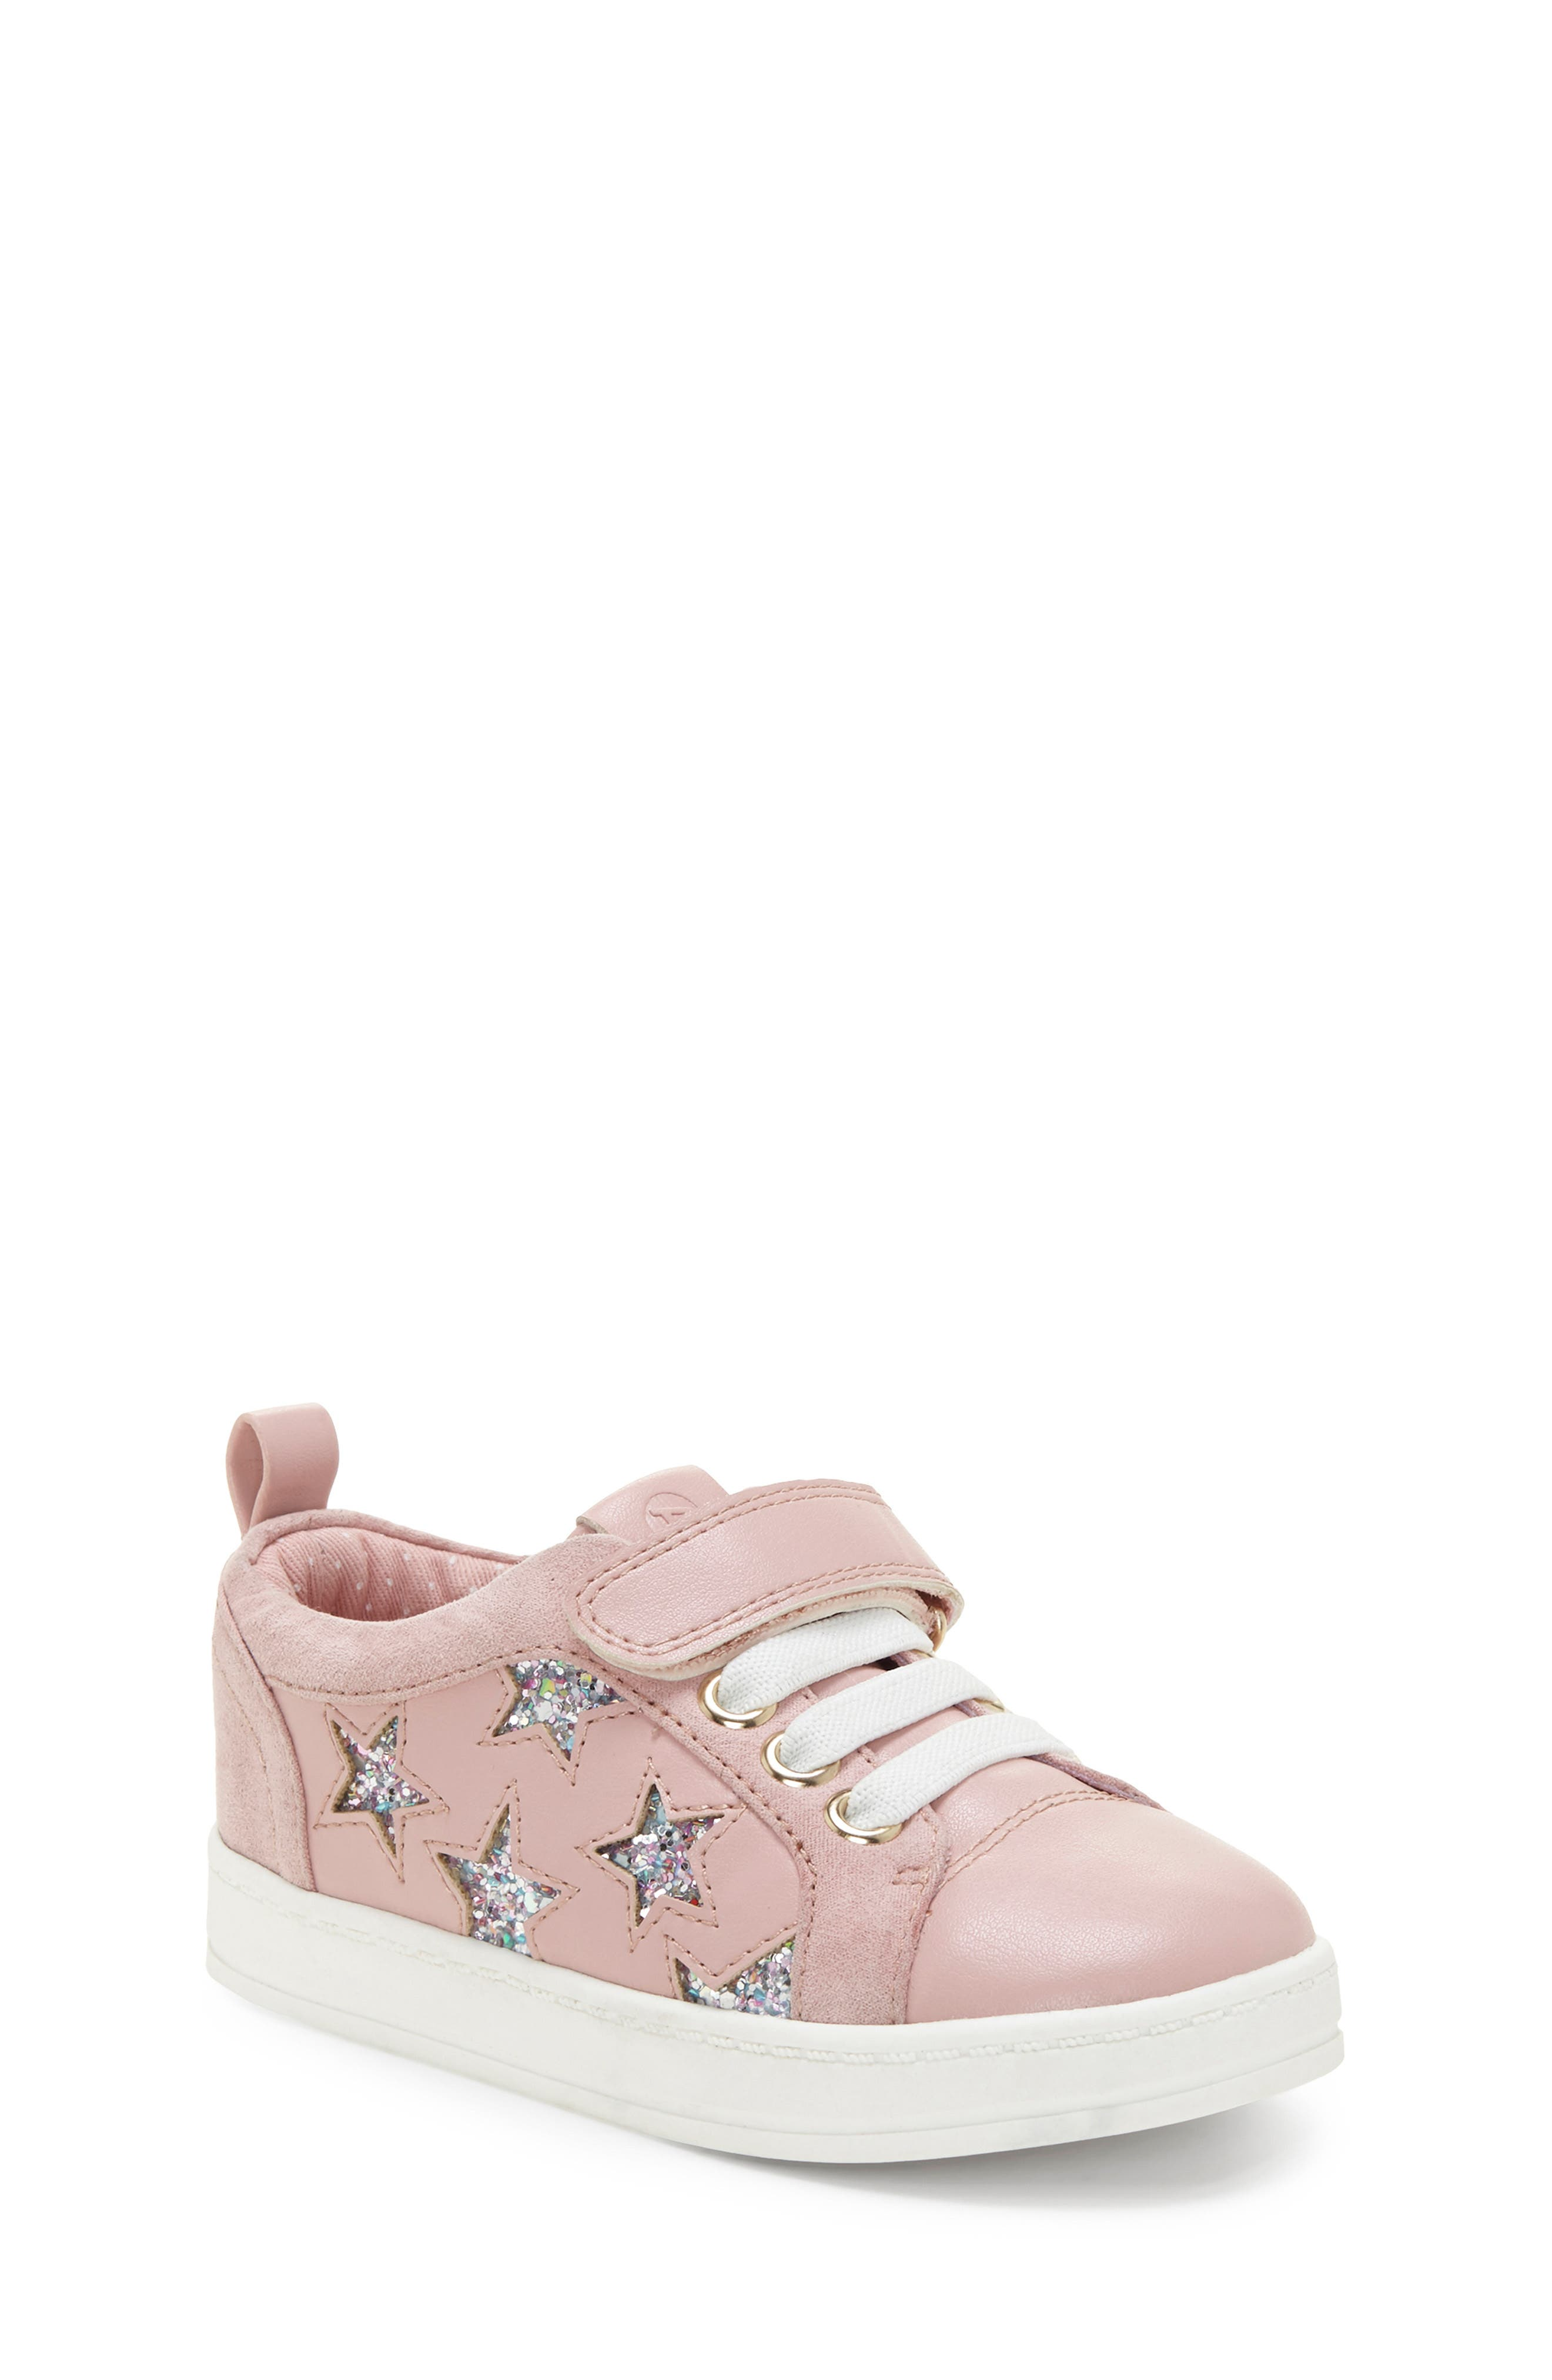 Infant Girls Sole Play Glitter Star Sneaker Size 4 M  Pink